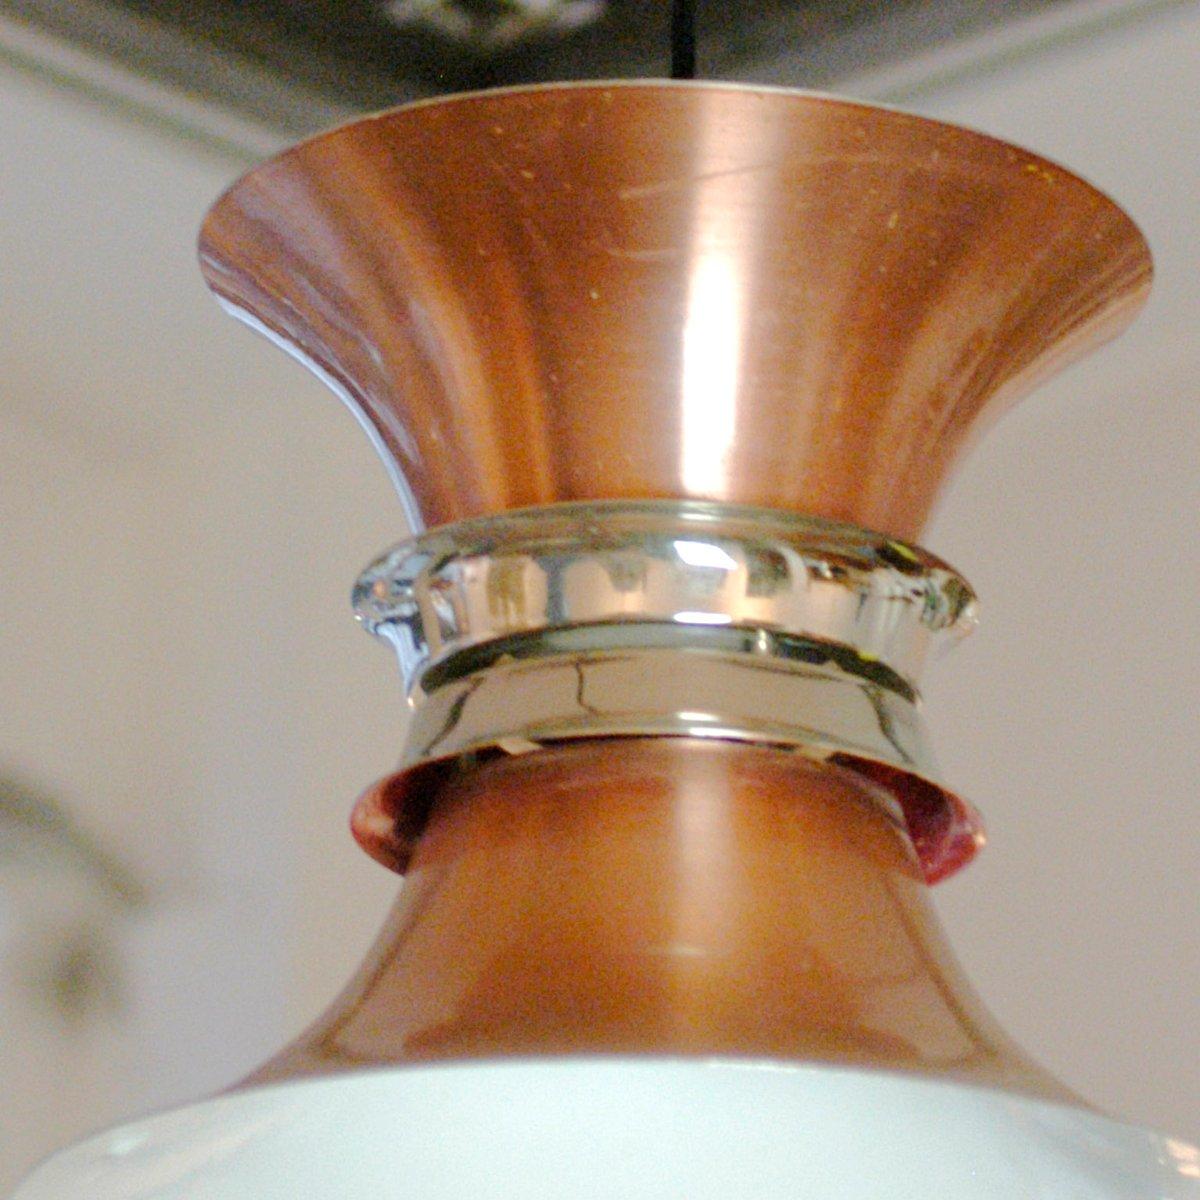 lampe suspension en cuivre danemark 1960s en vente sur pamono. Black Bedroom Furniture Sets. Home Design Ideas